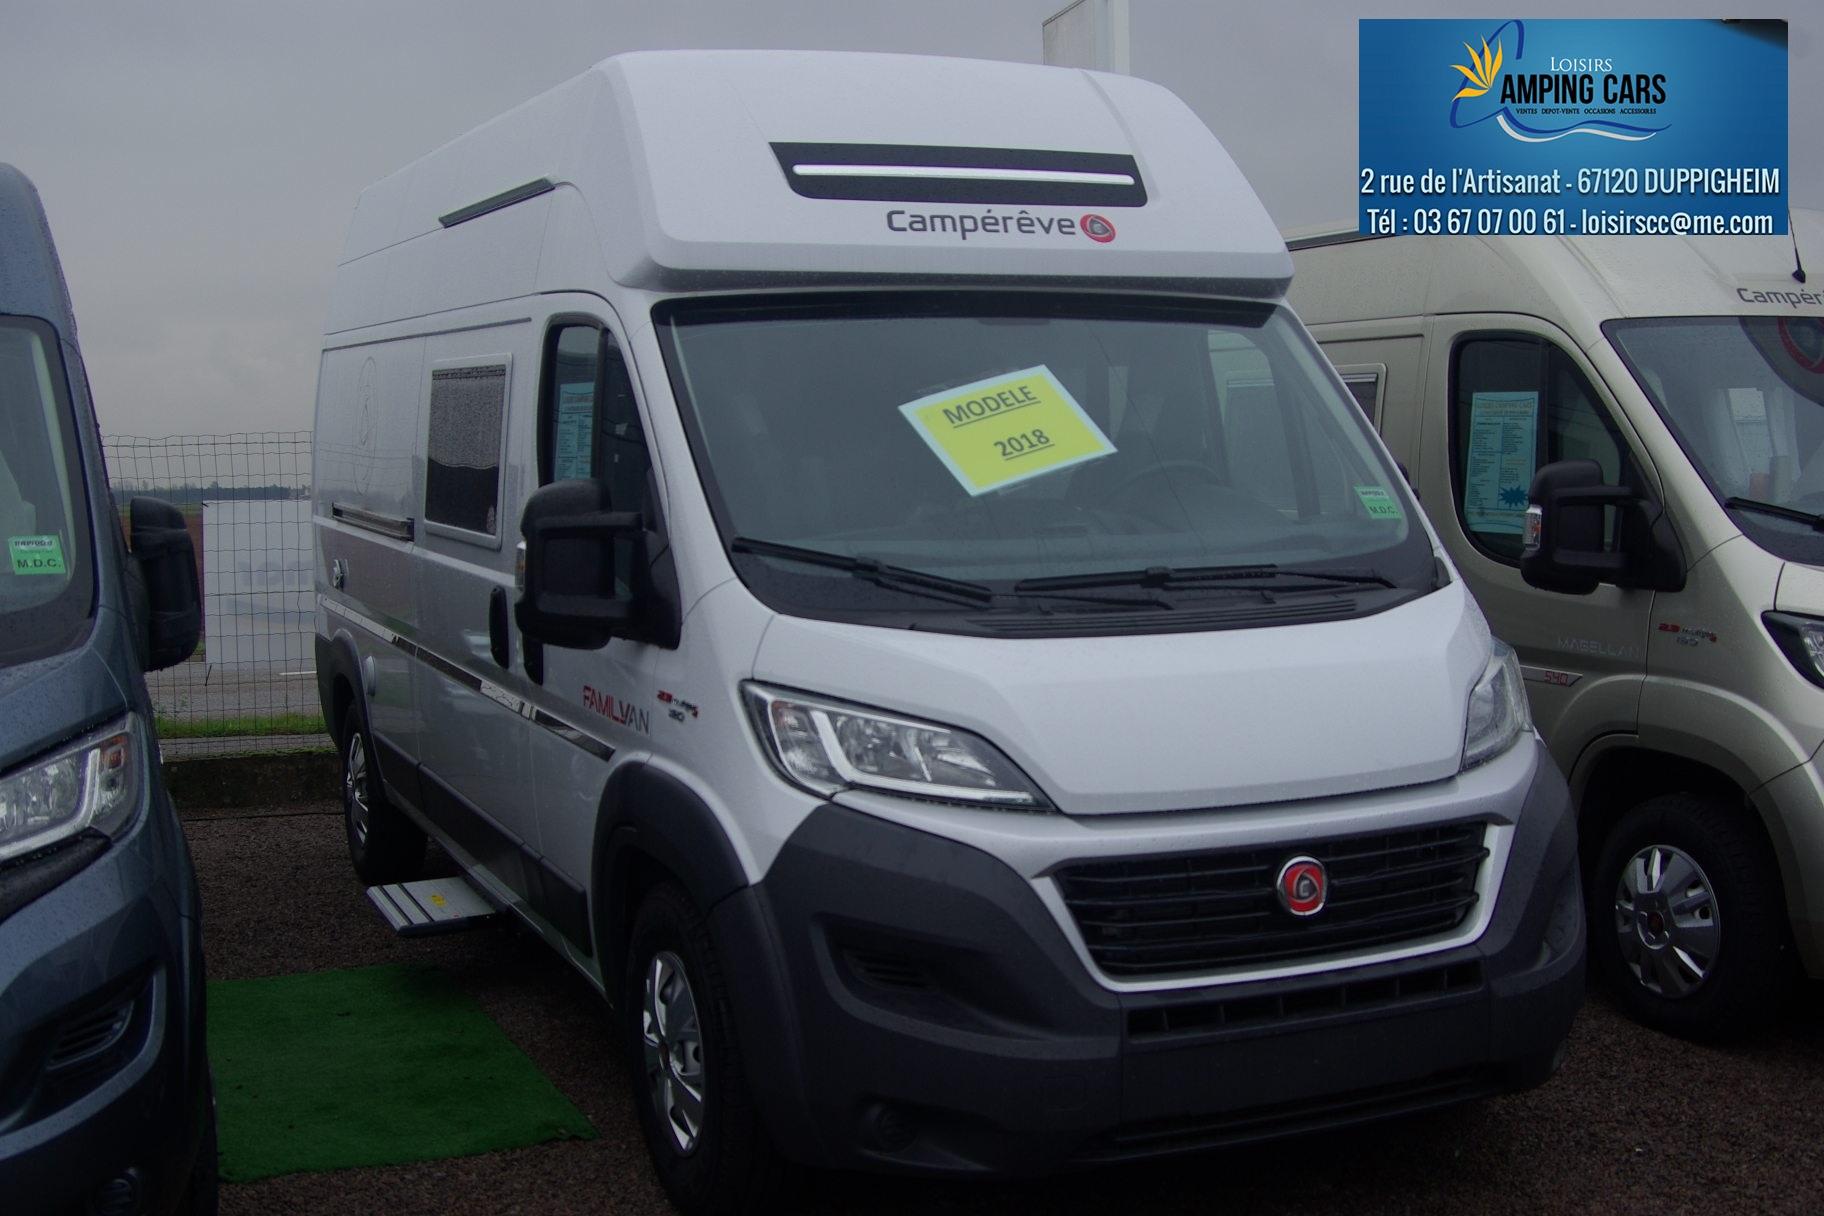 campereve family van neuf de 2018 fiat camping car en vente duppigheim rhin 67. Black Bedroom Furniture Sets. Home Design Ideas